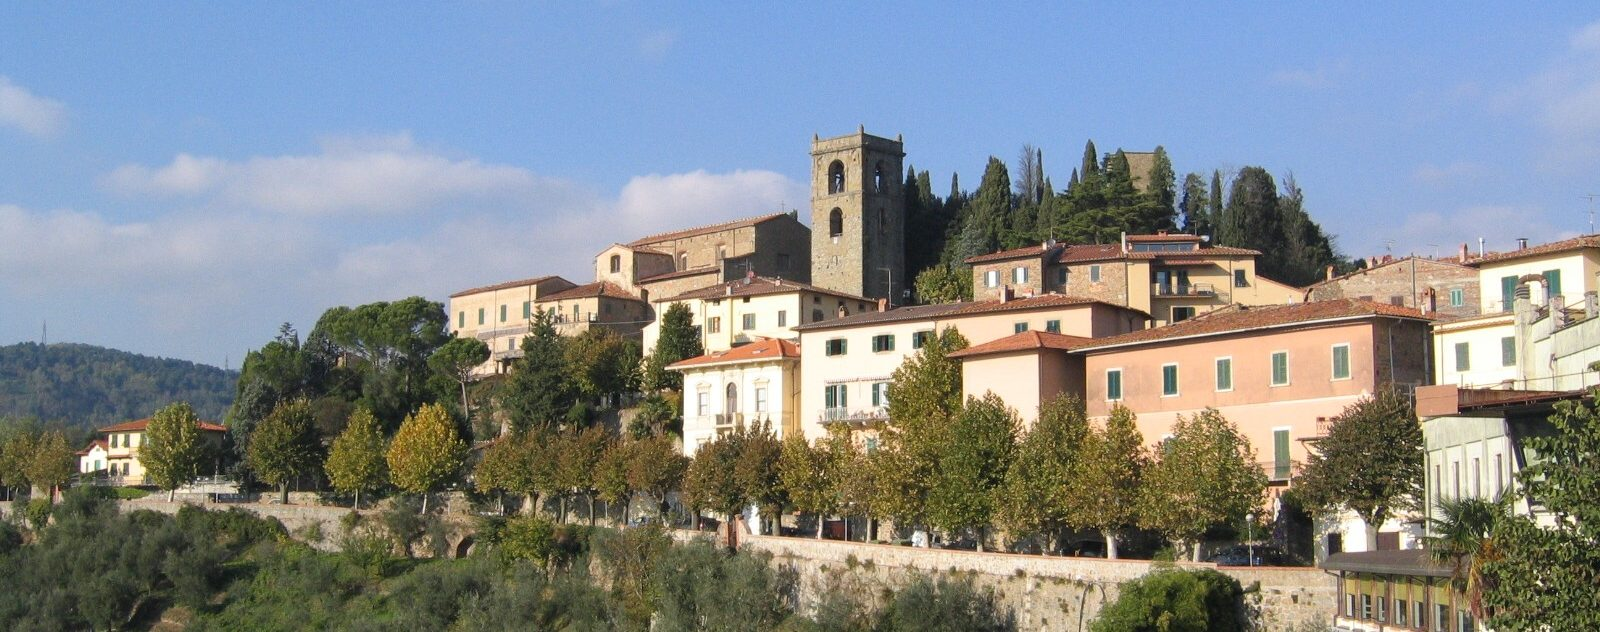 Montecatini Alto near Montecatini Terme